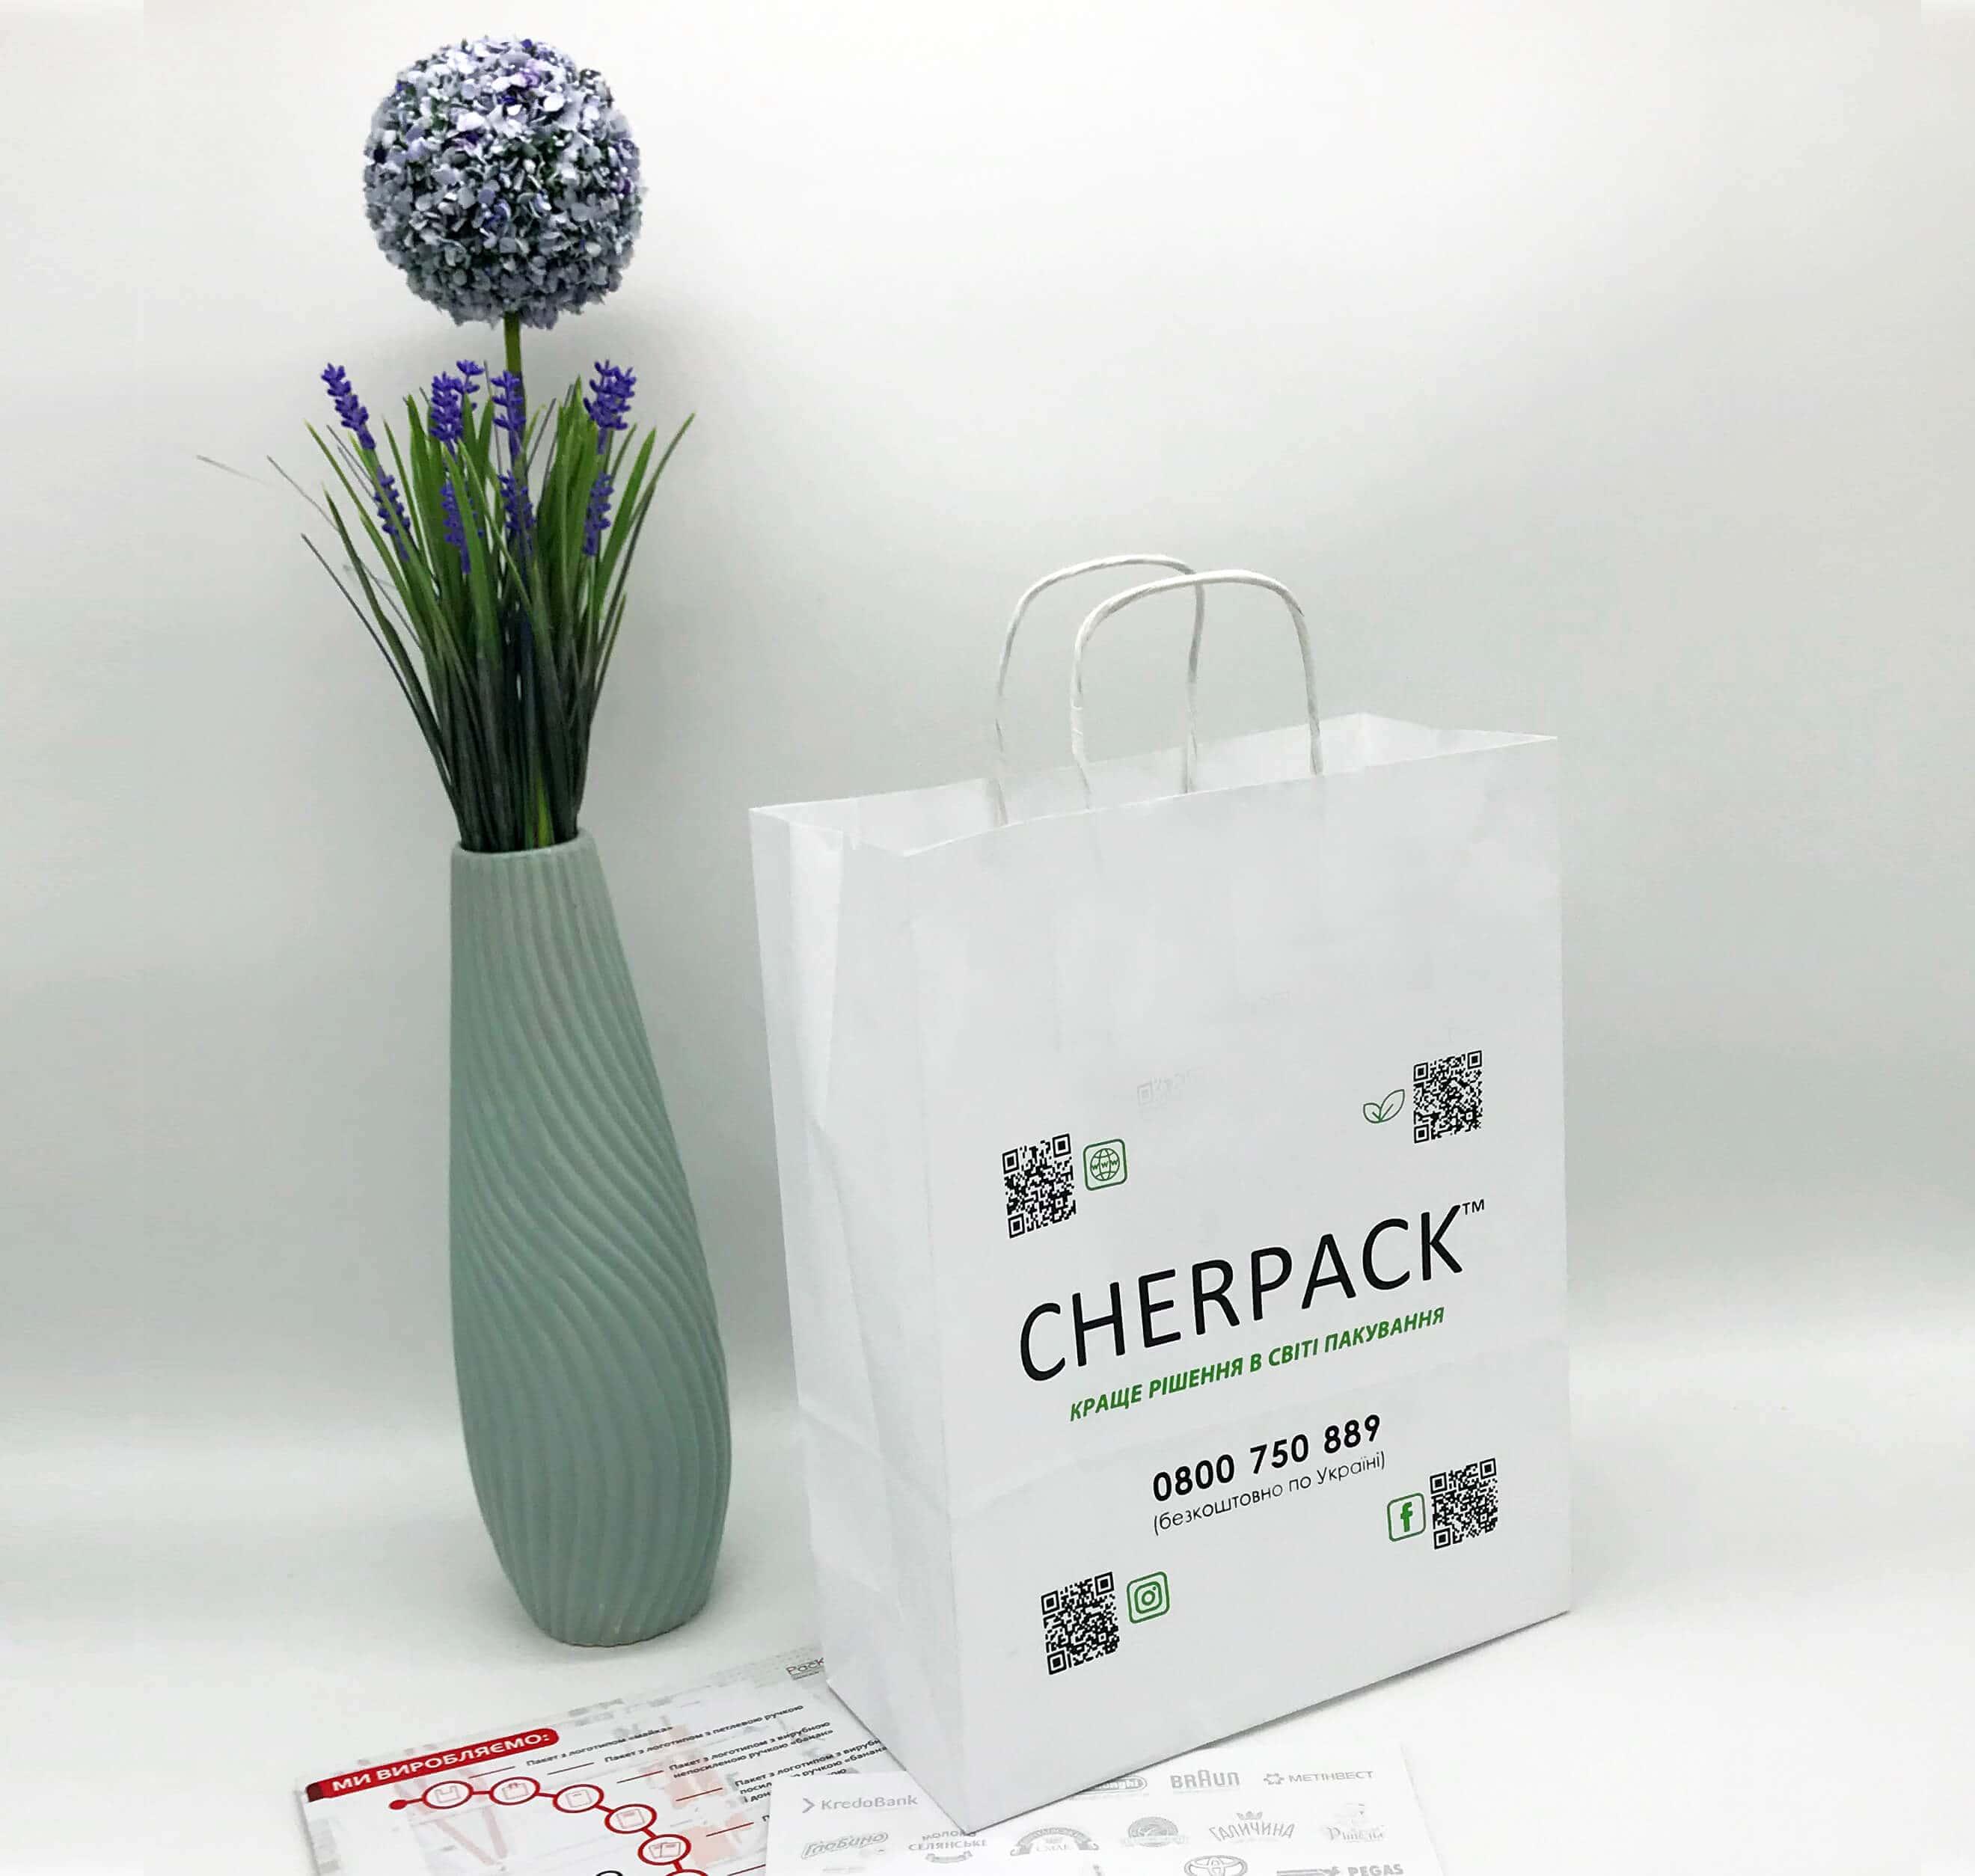 Белый крафт пакет с логотипом 250*320, 90 г/см -Chernigov Package - Фото Белый мал